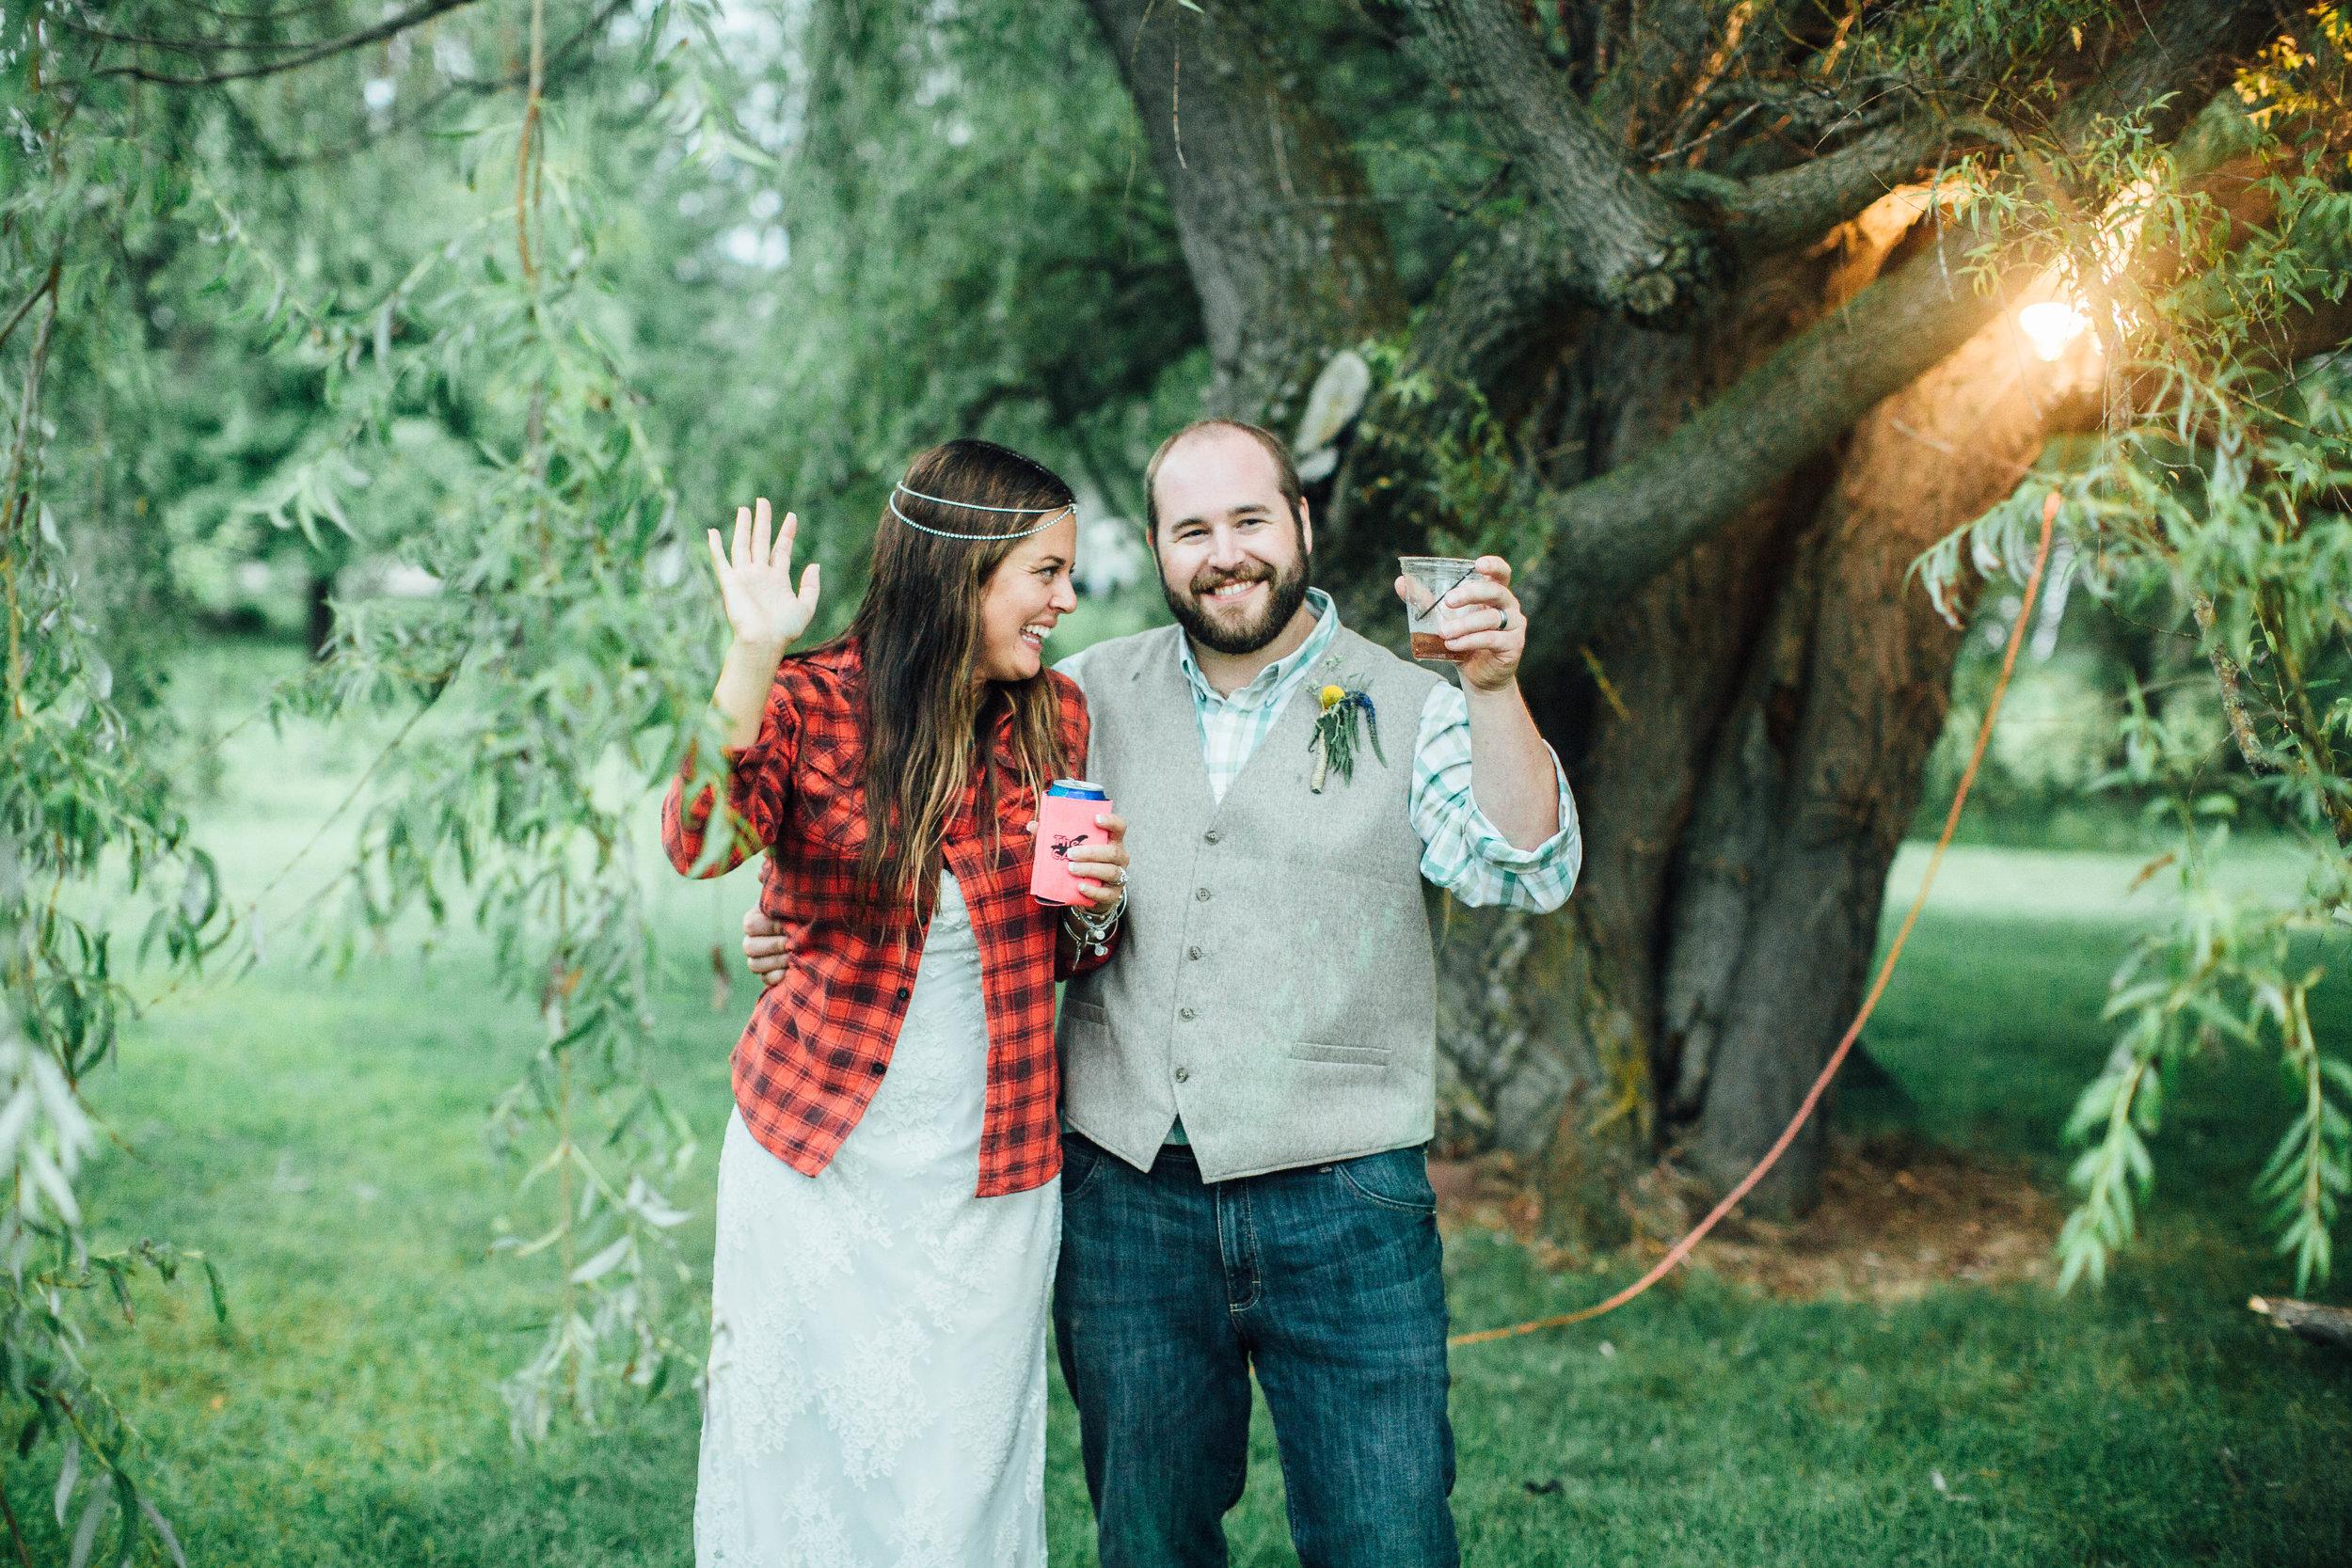 Bohemian Wedding - Sabrina Leigh Studios - Northern Michigan Wedding Photographer113.jpg